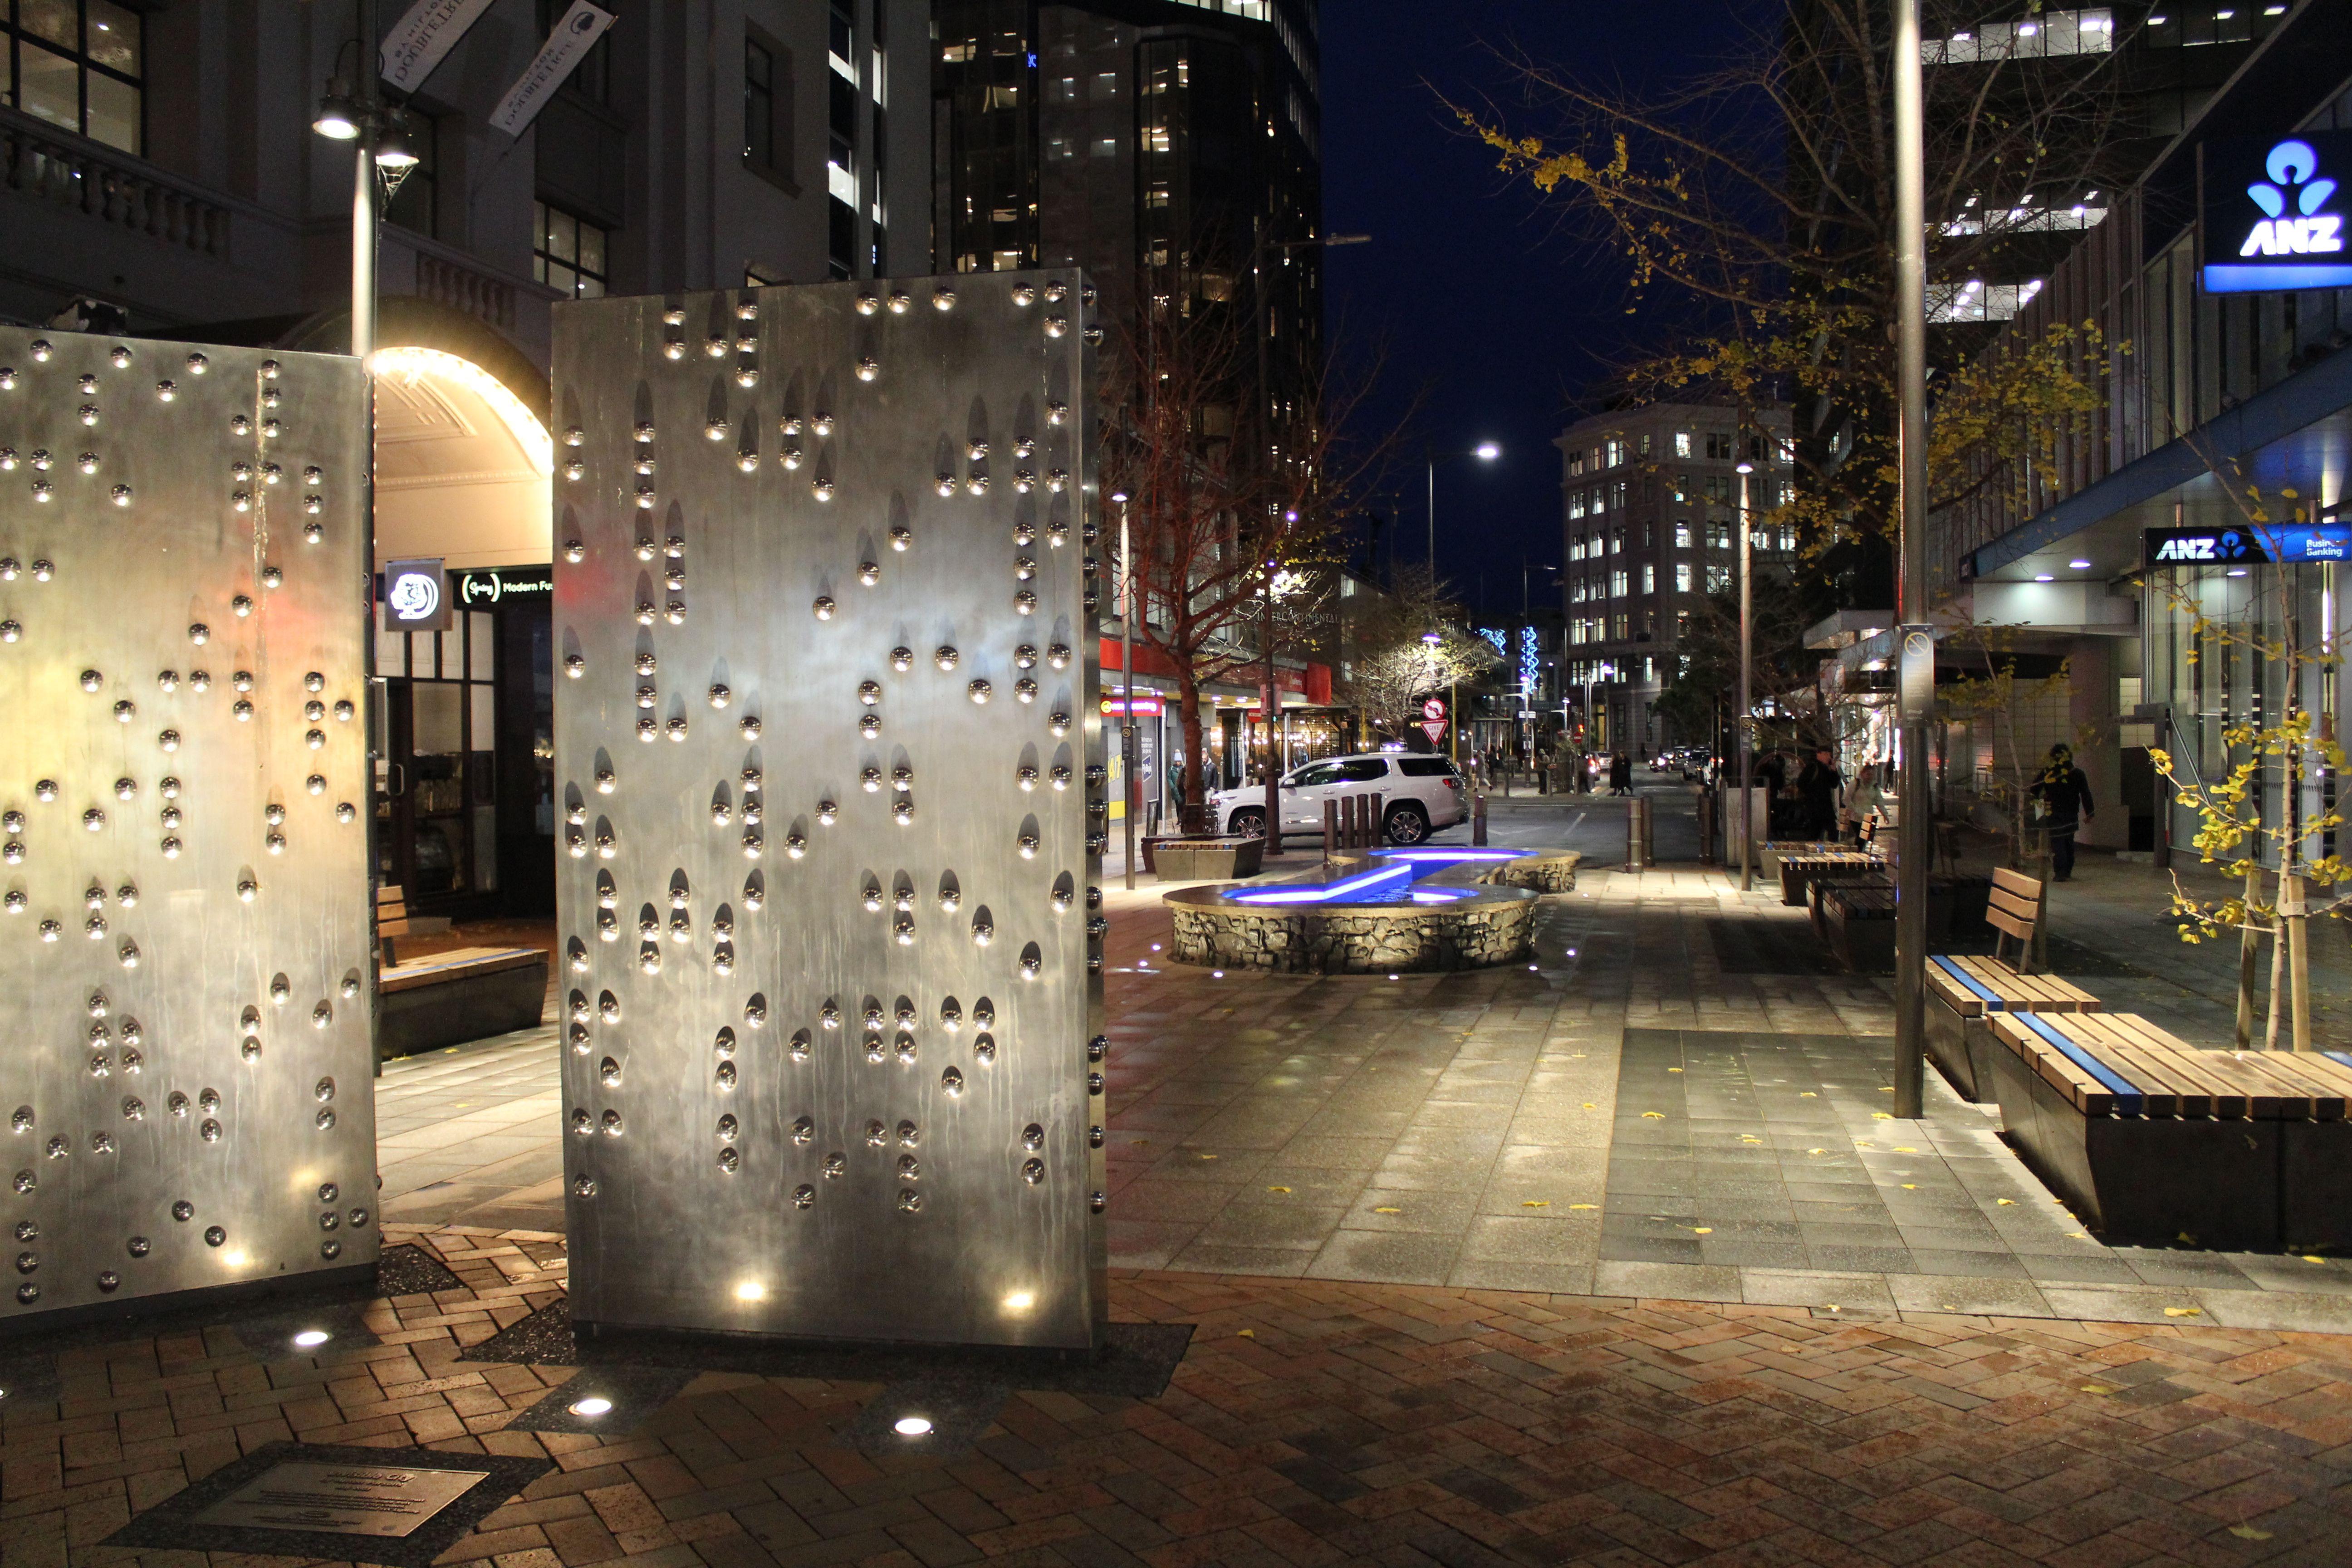 #lighting #STlighting #urban #lightingdesign #wellington #NZ #iguzzini